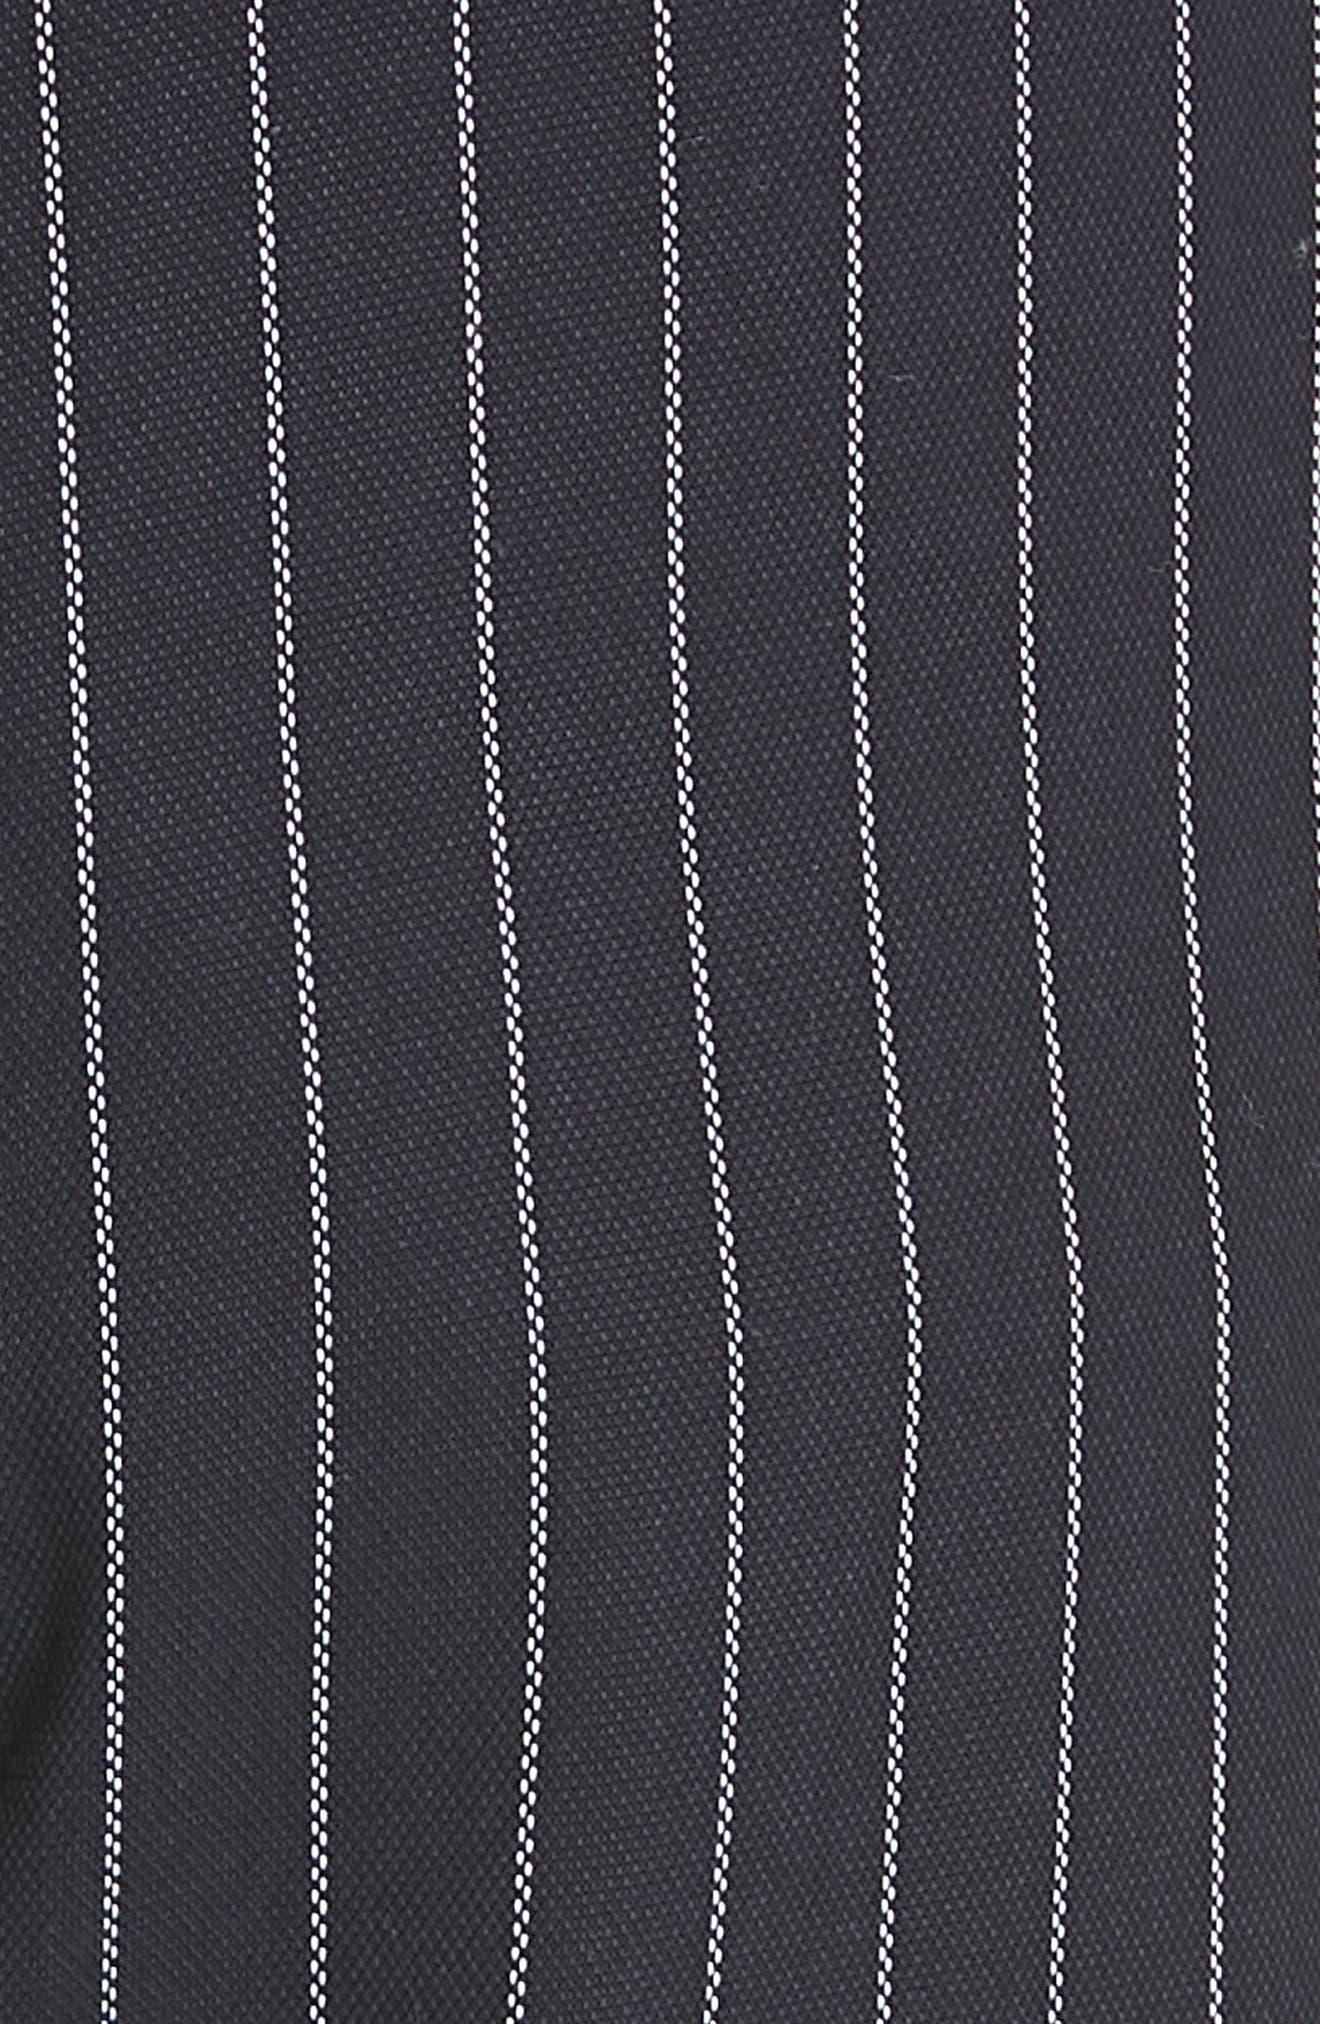 Pinstripe Crop Wide-Leg Pants,                             Alternate thumbnail 6, color,                             INDIGO